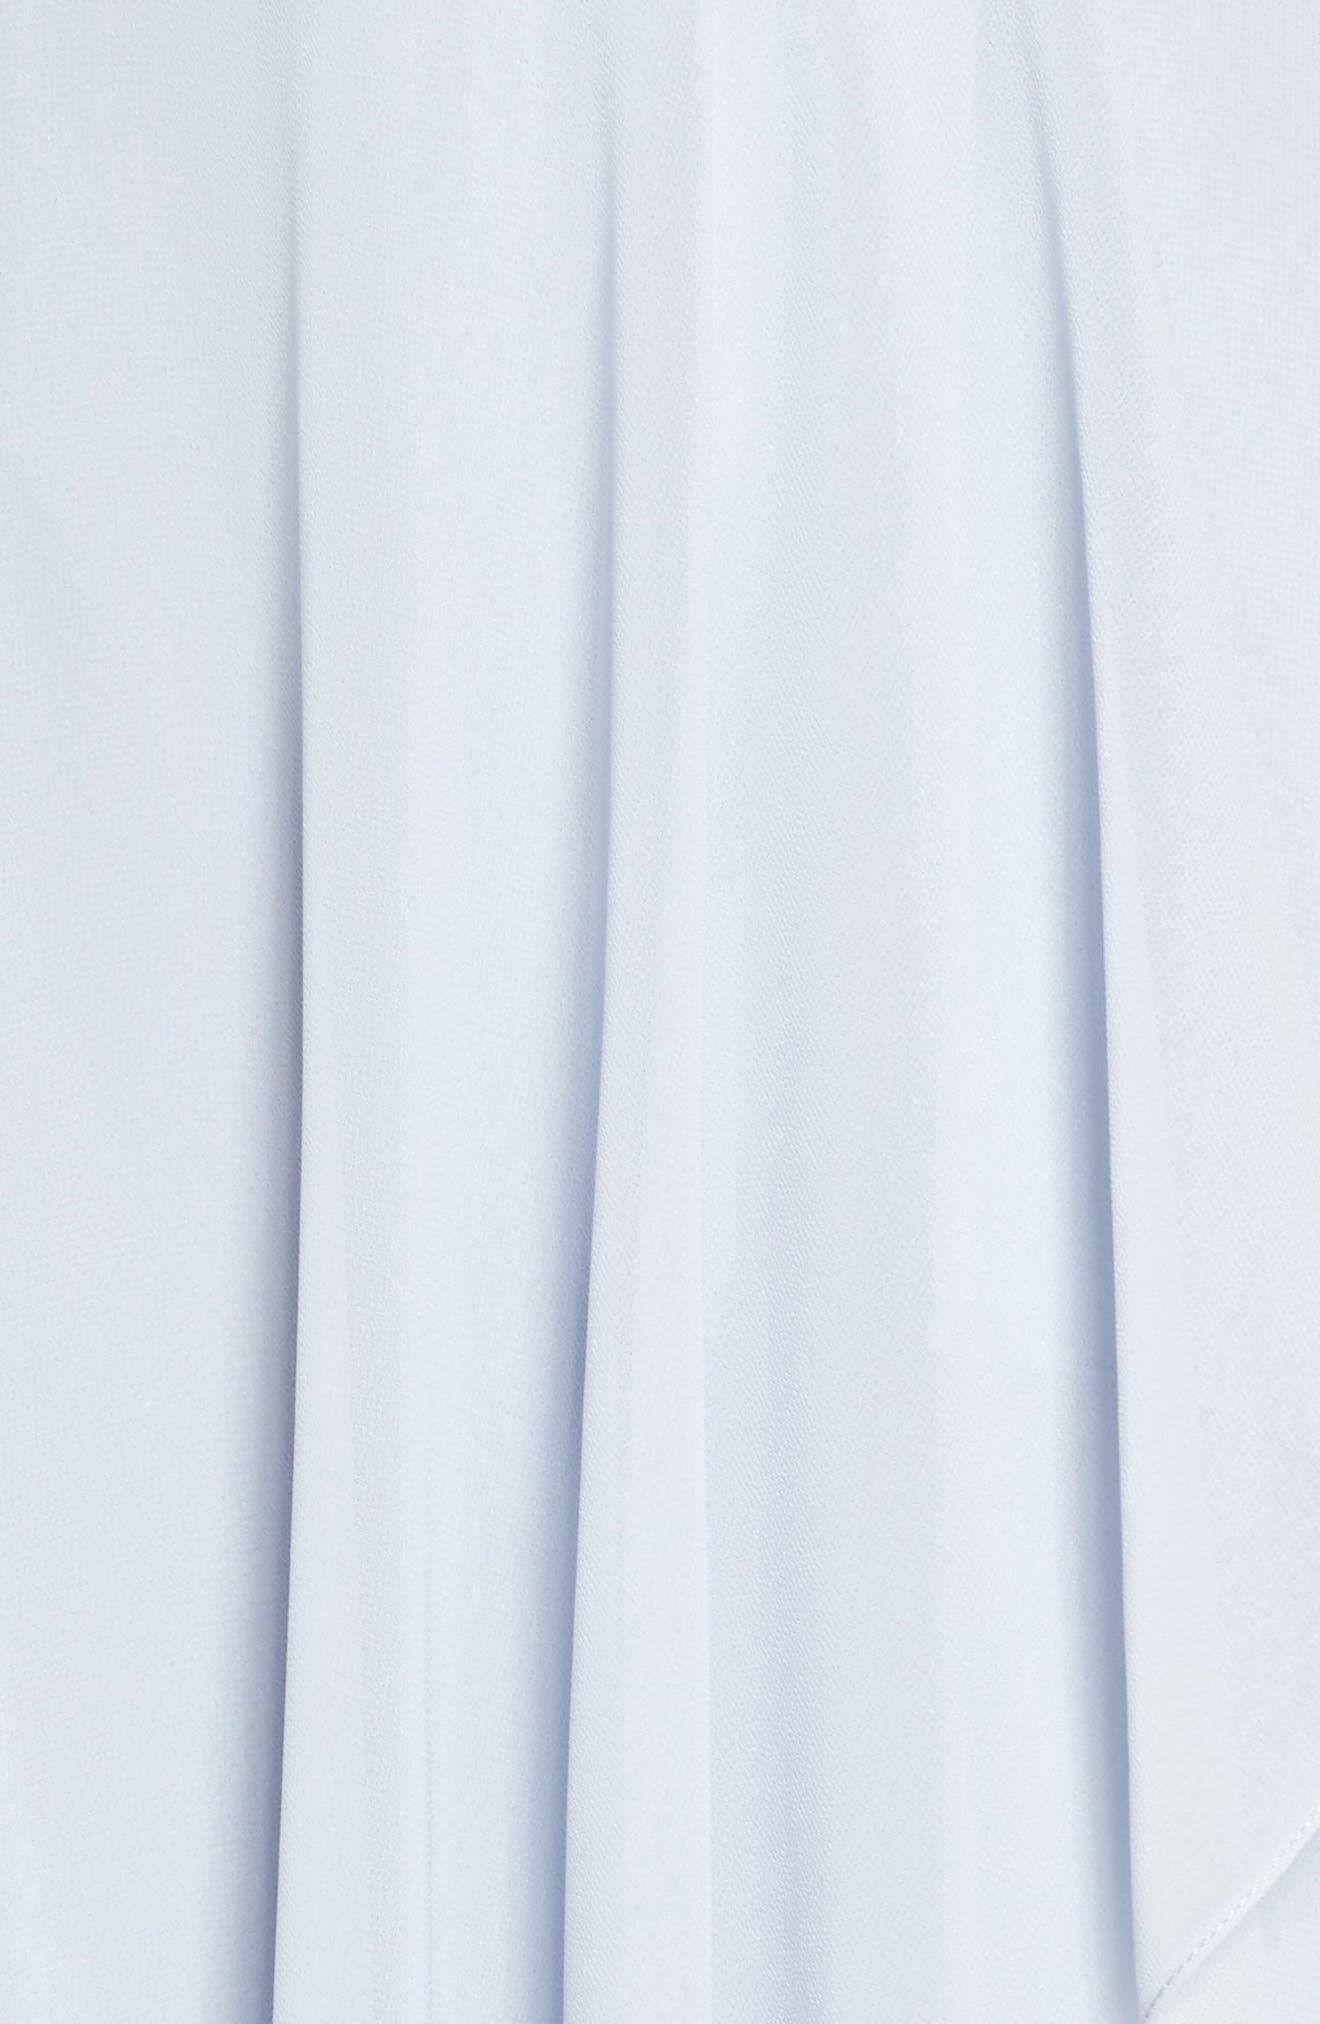 JENNY YOO, Farrah Ruffle Chiffon Gown, Alternate thumbnail 7, color, WHISPER BLUE